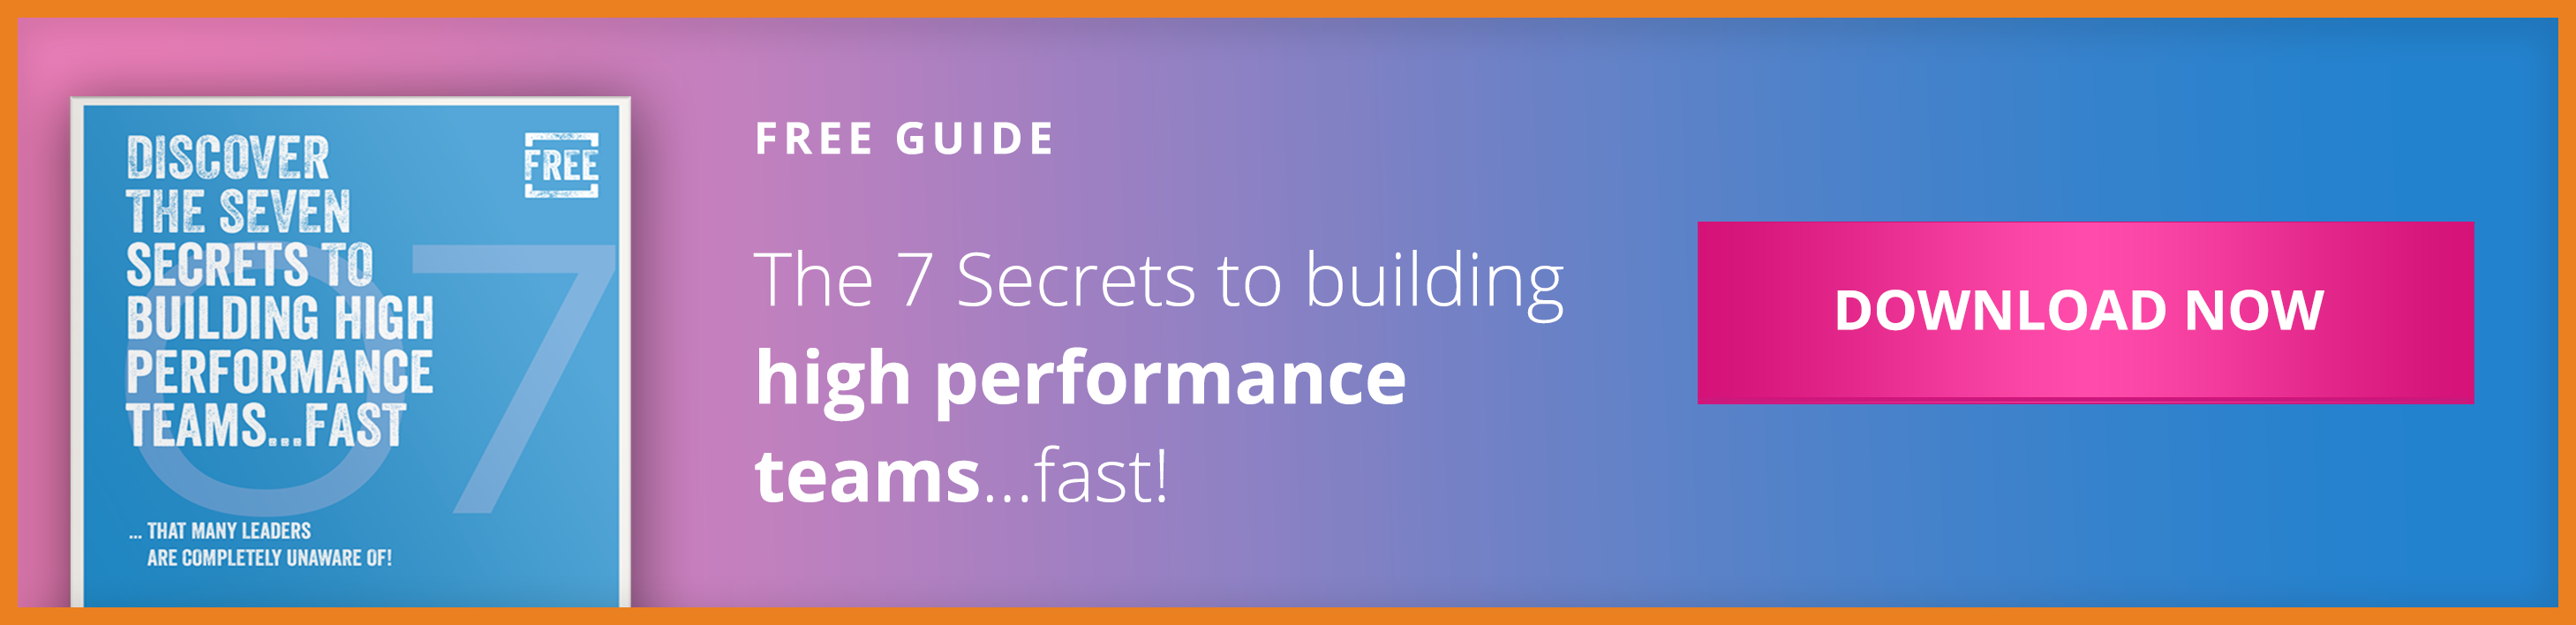 The Seven Secrets To Building High Performance Teams CTA